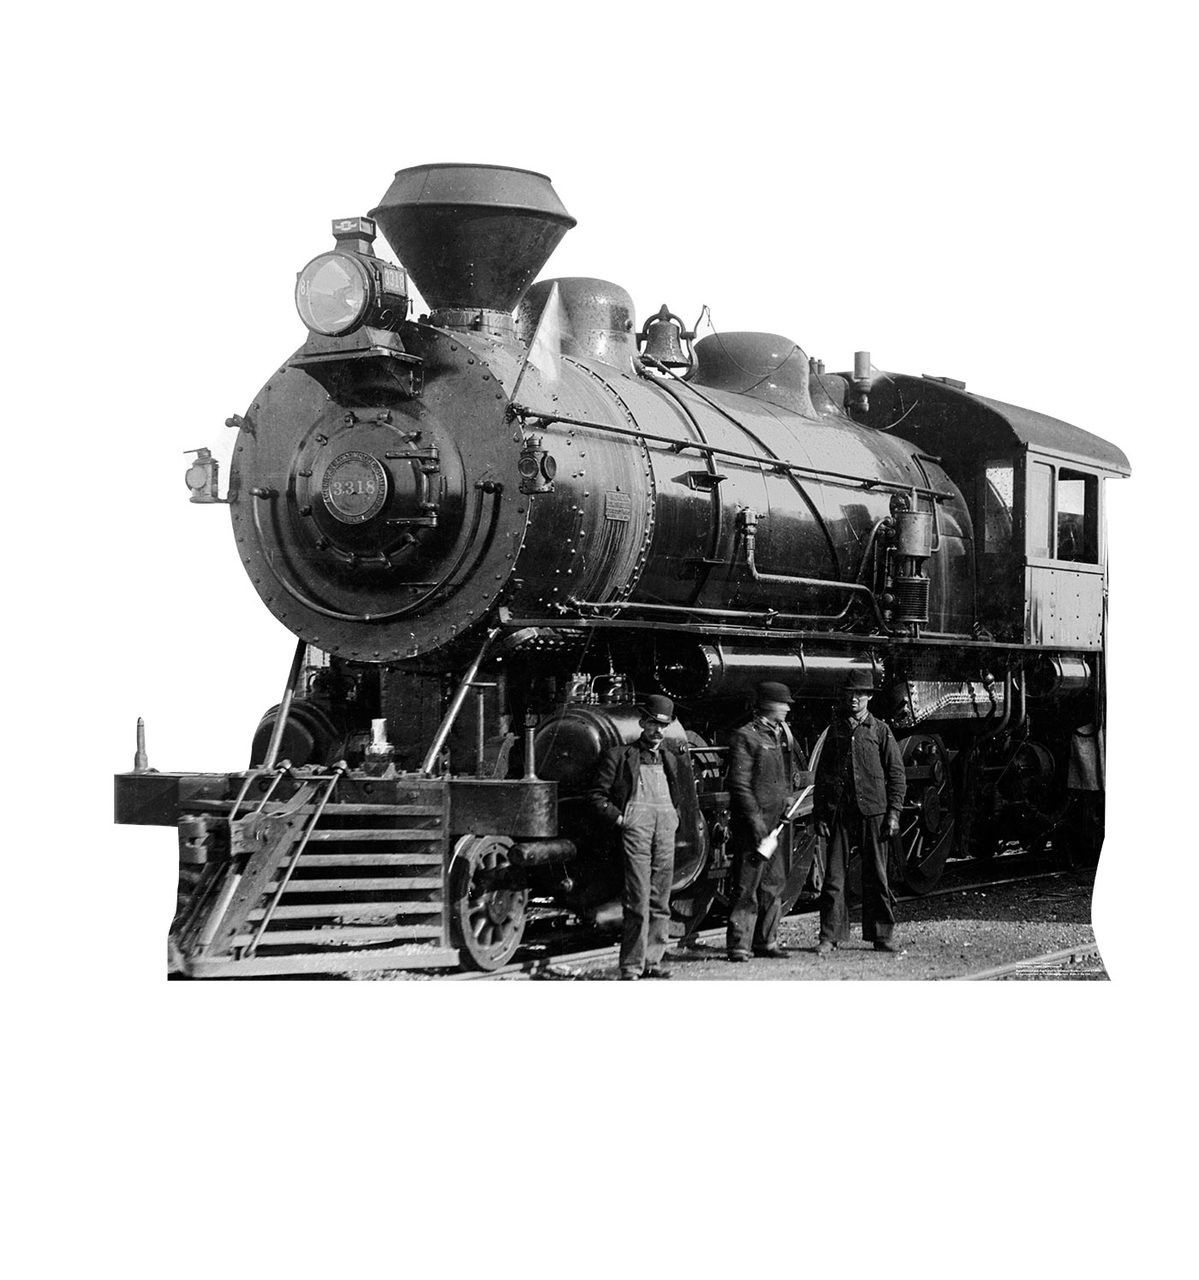 Life-size Antique Steam Engine Cardboard Standup